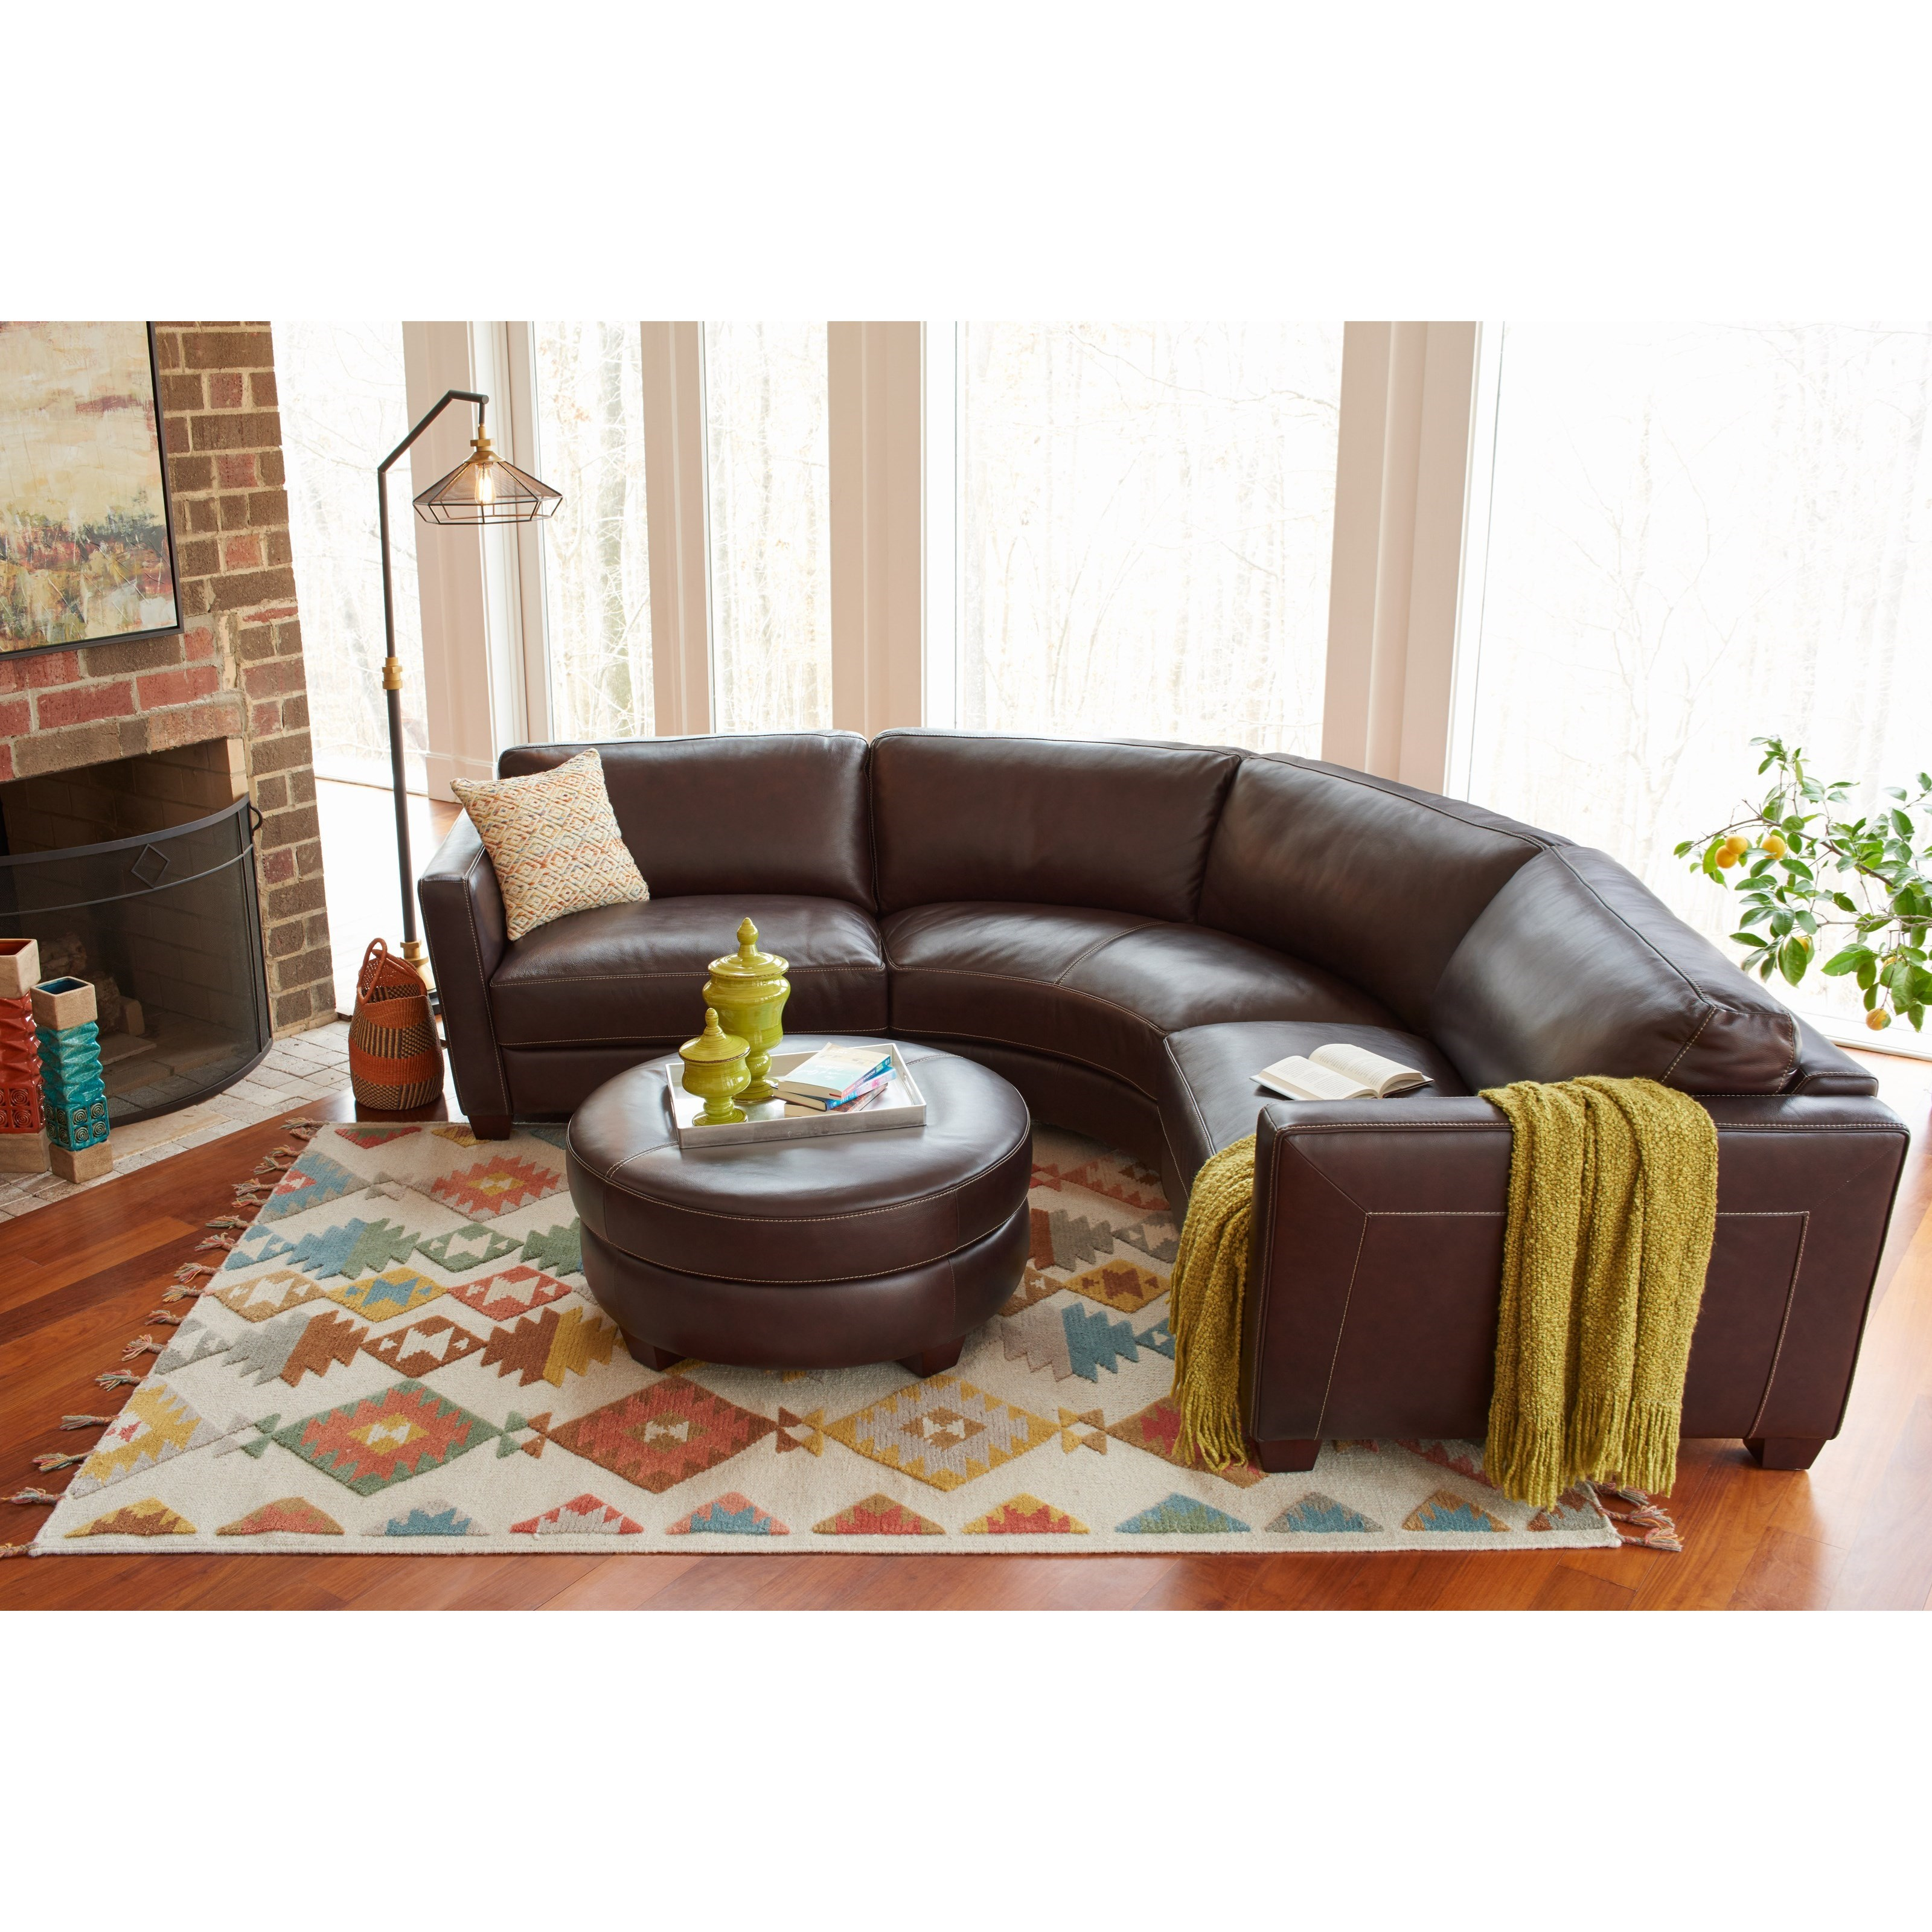 Charmant 3 Pc Sectional Sofa